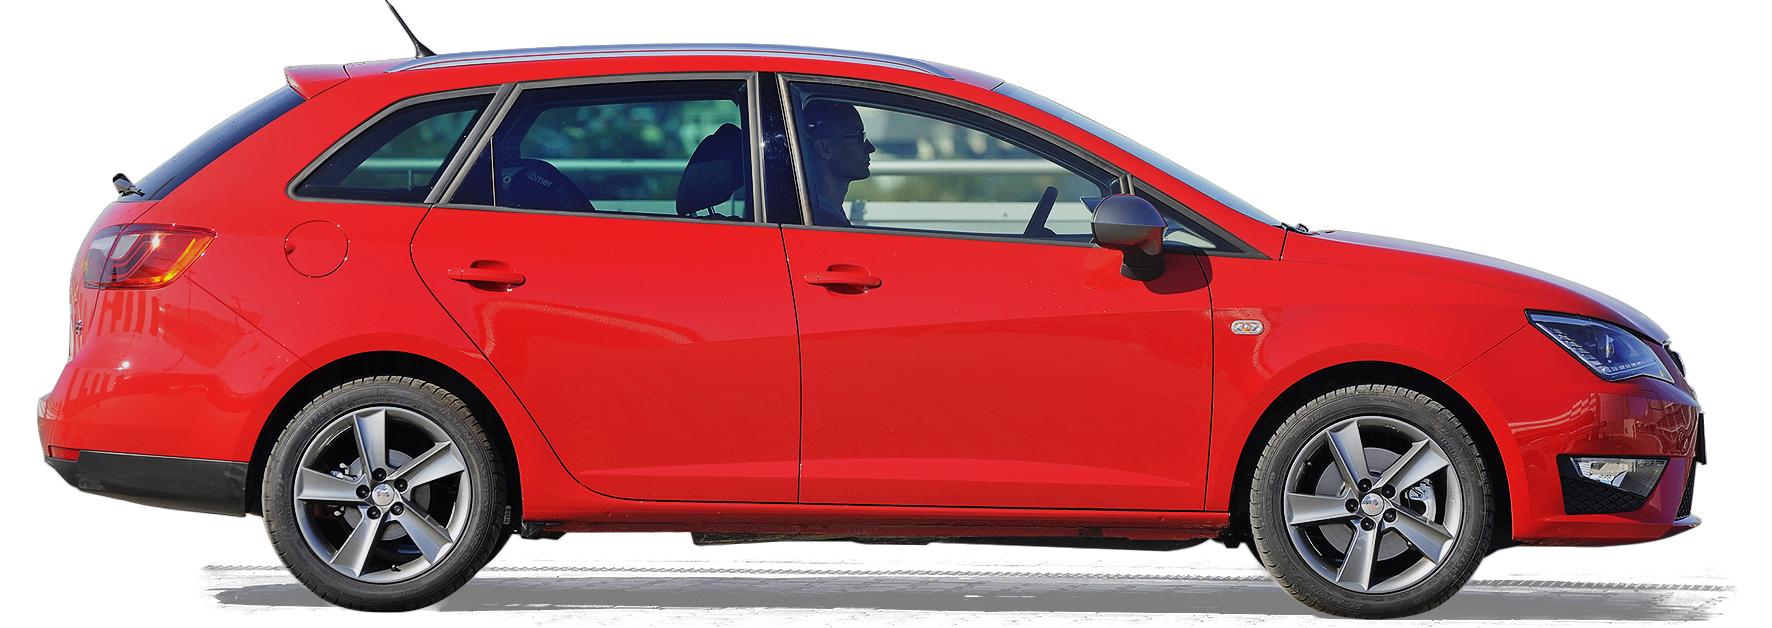 Seat Ibiza IV (2010-2016)